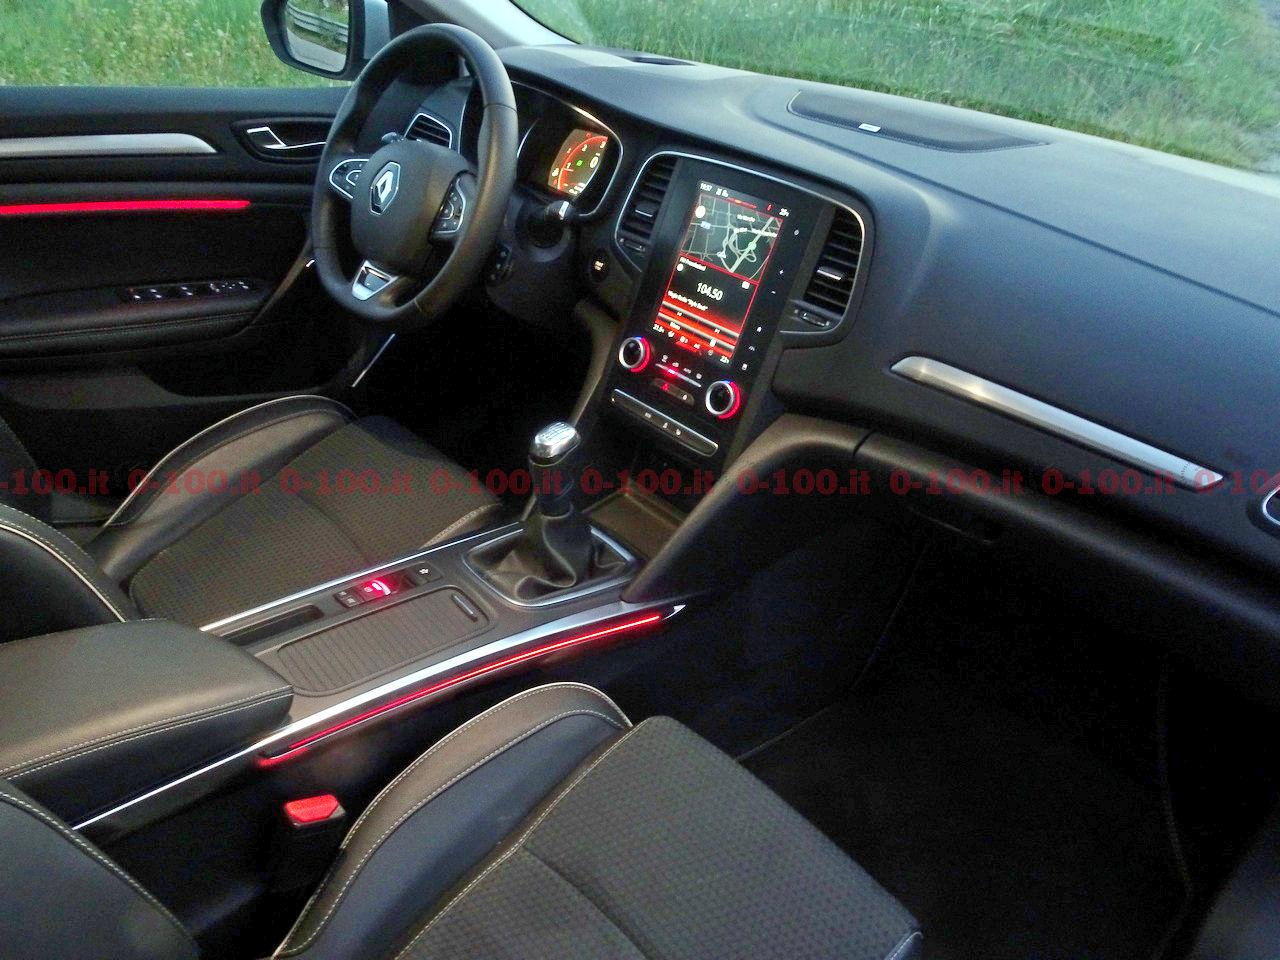 Renault-Megane-GT-Bose-dCi-130-test-prova-opinioni_0-100_31